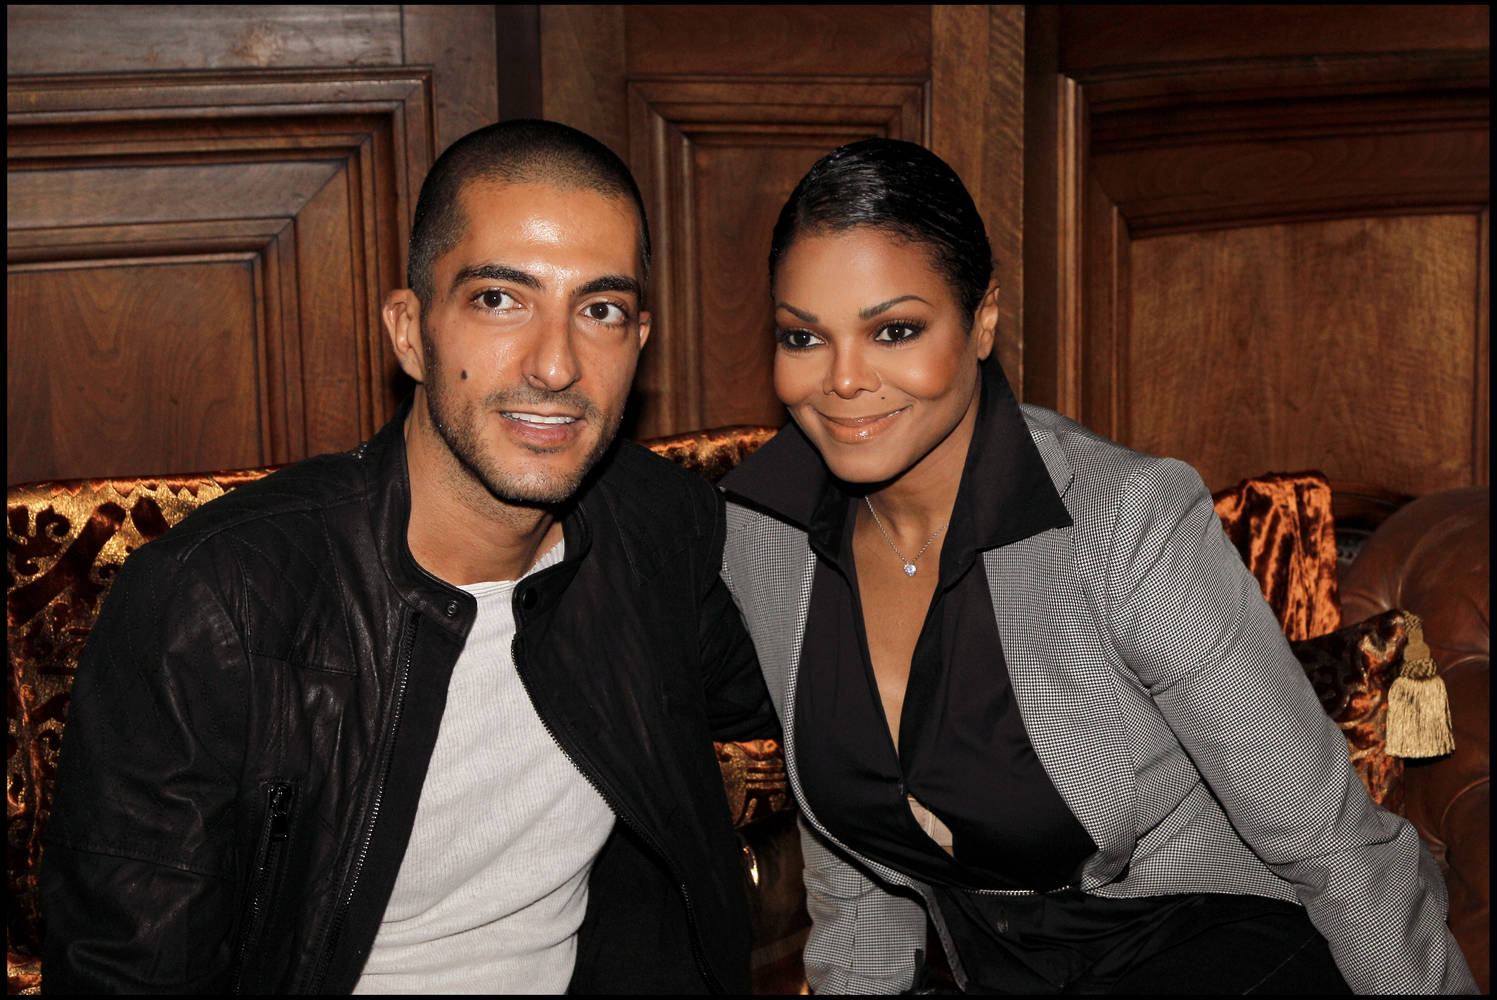 Janet Jackson and billionaire husband, Wissam Al Mana